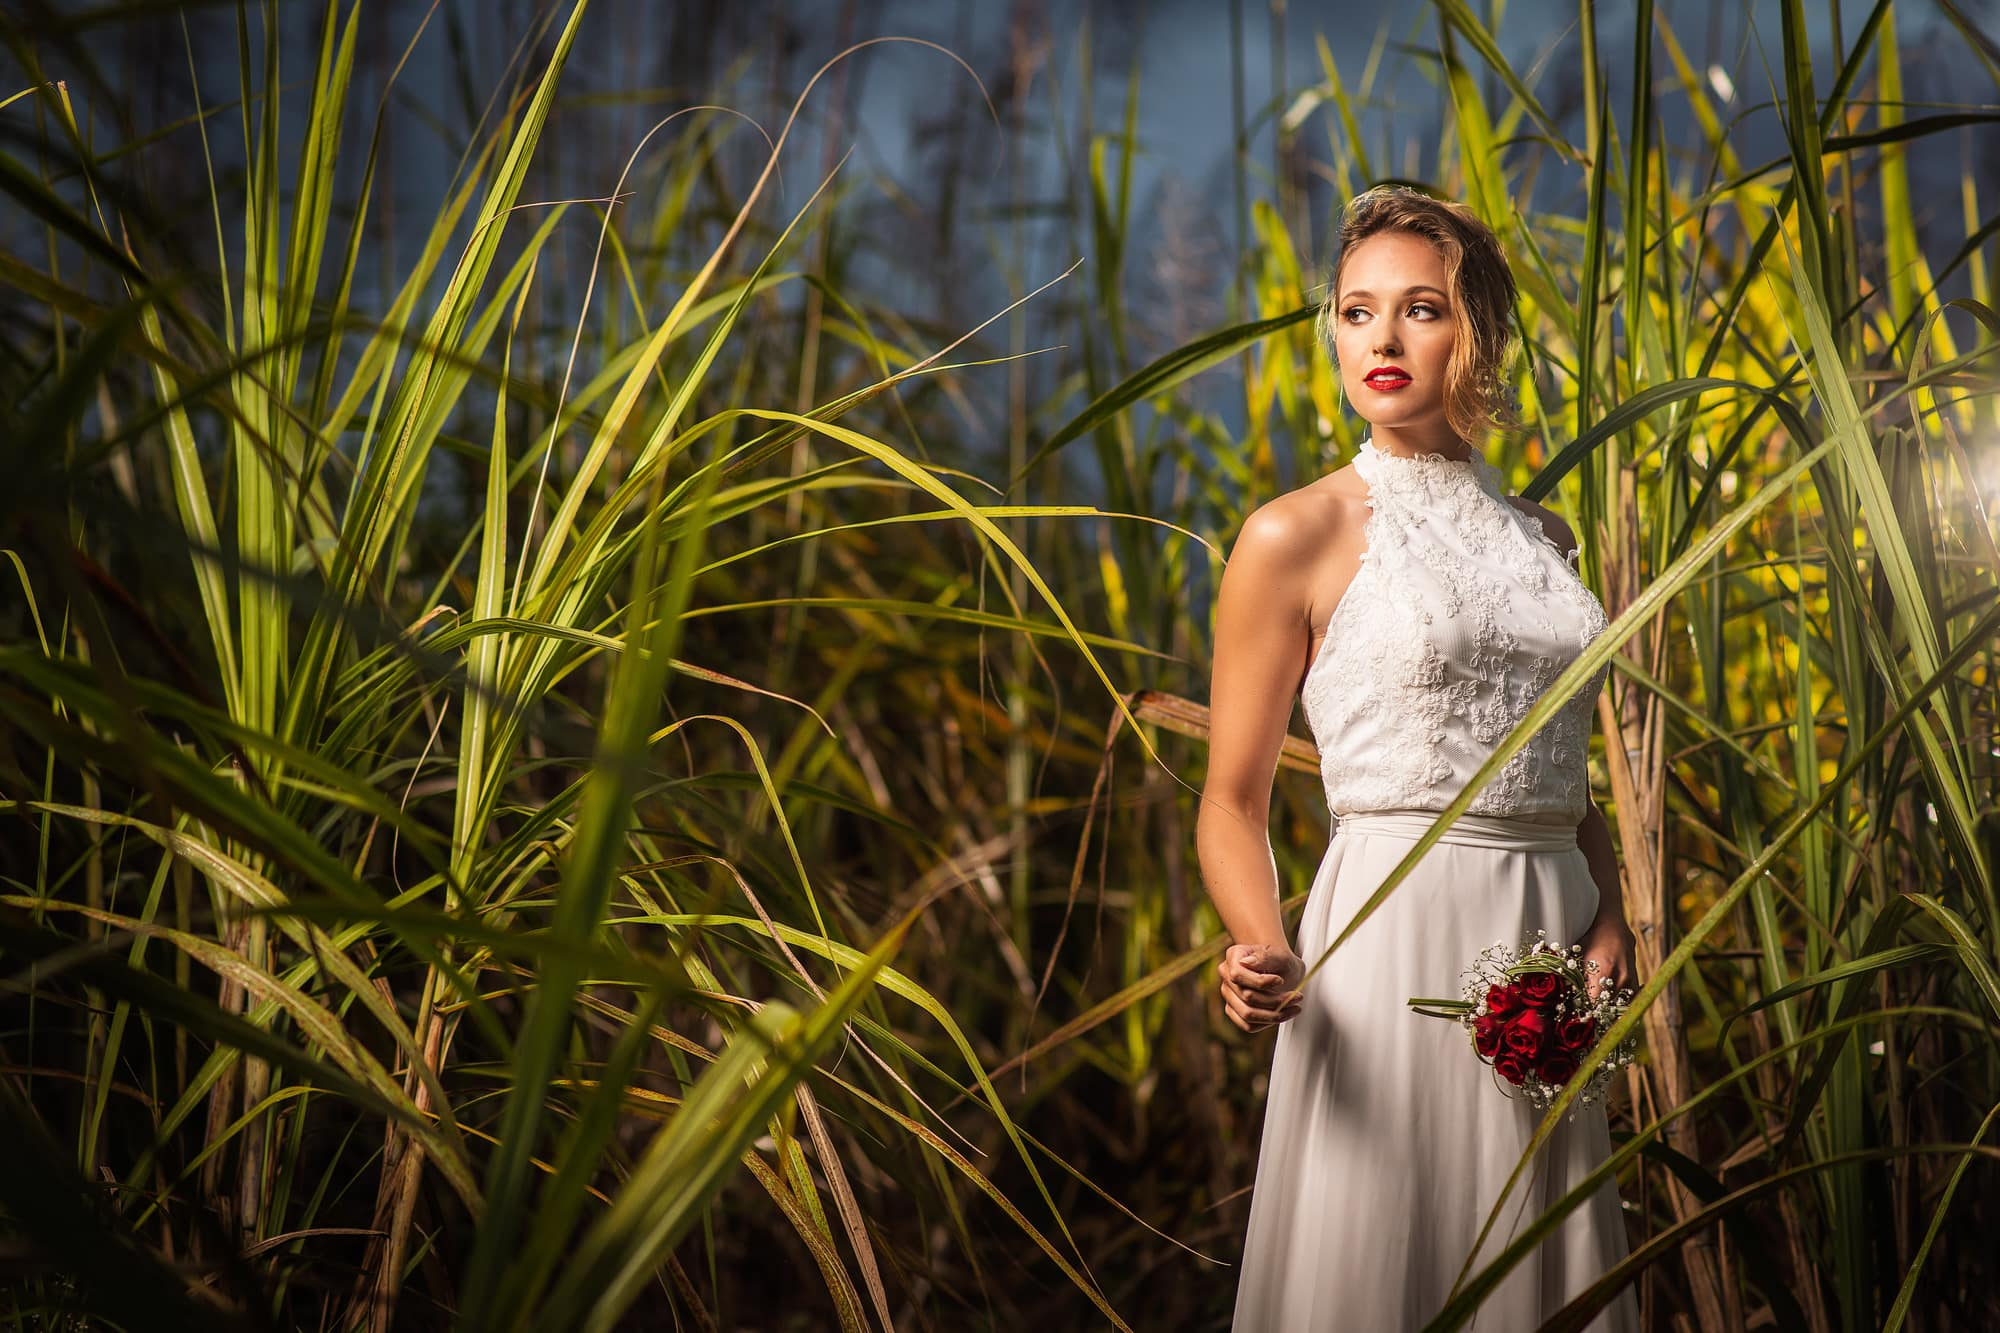 Sugar cane photoshoot Bridal session-10.jpg